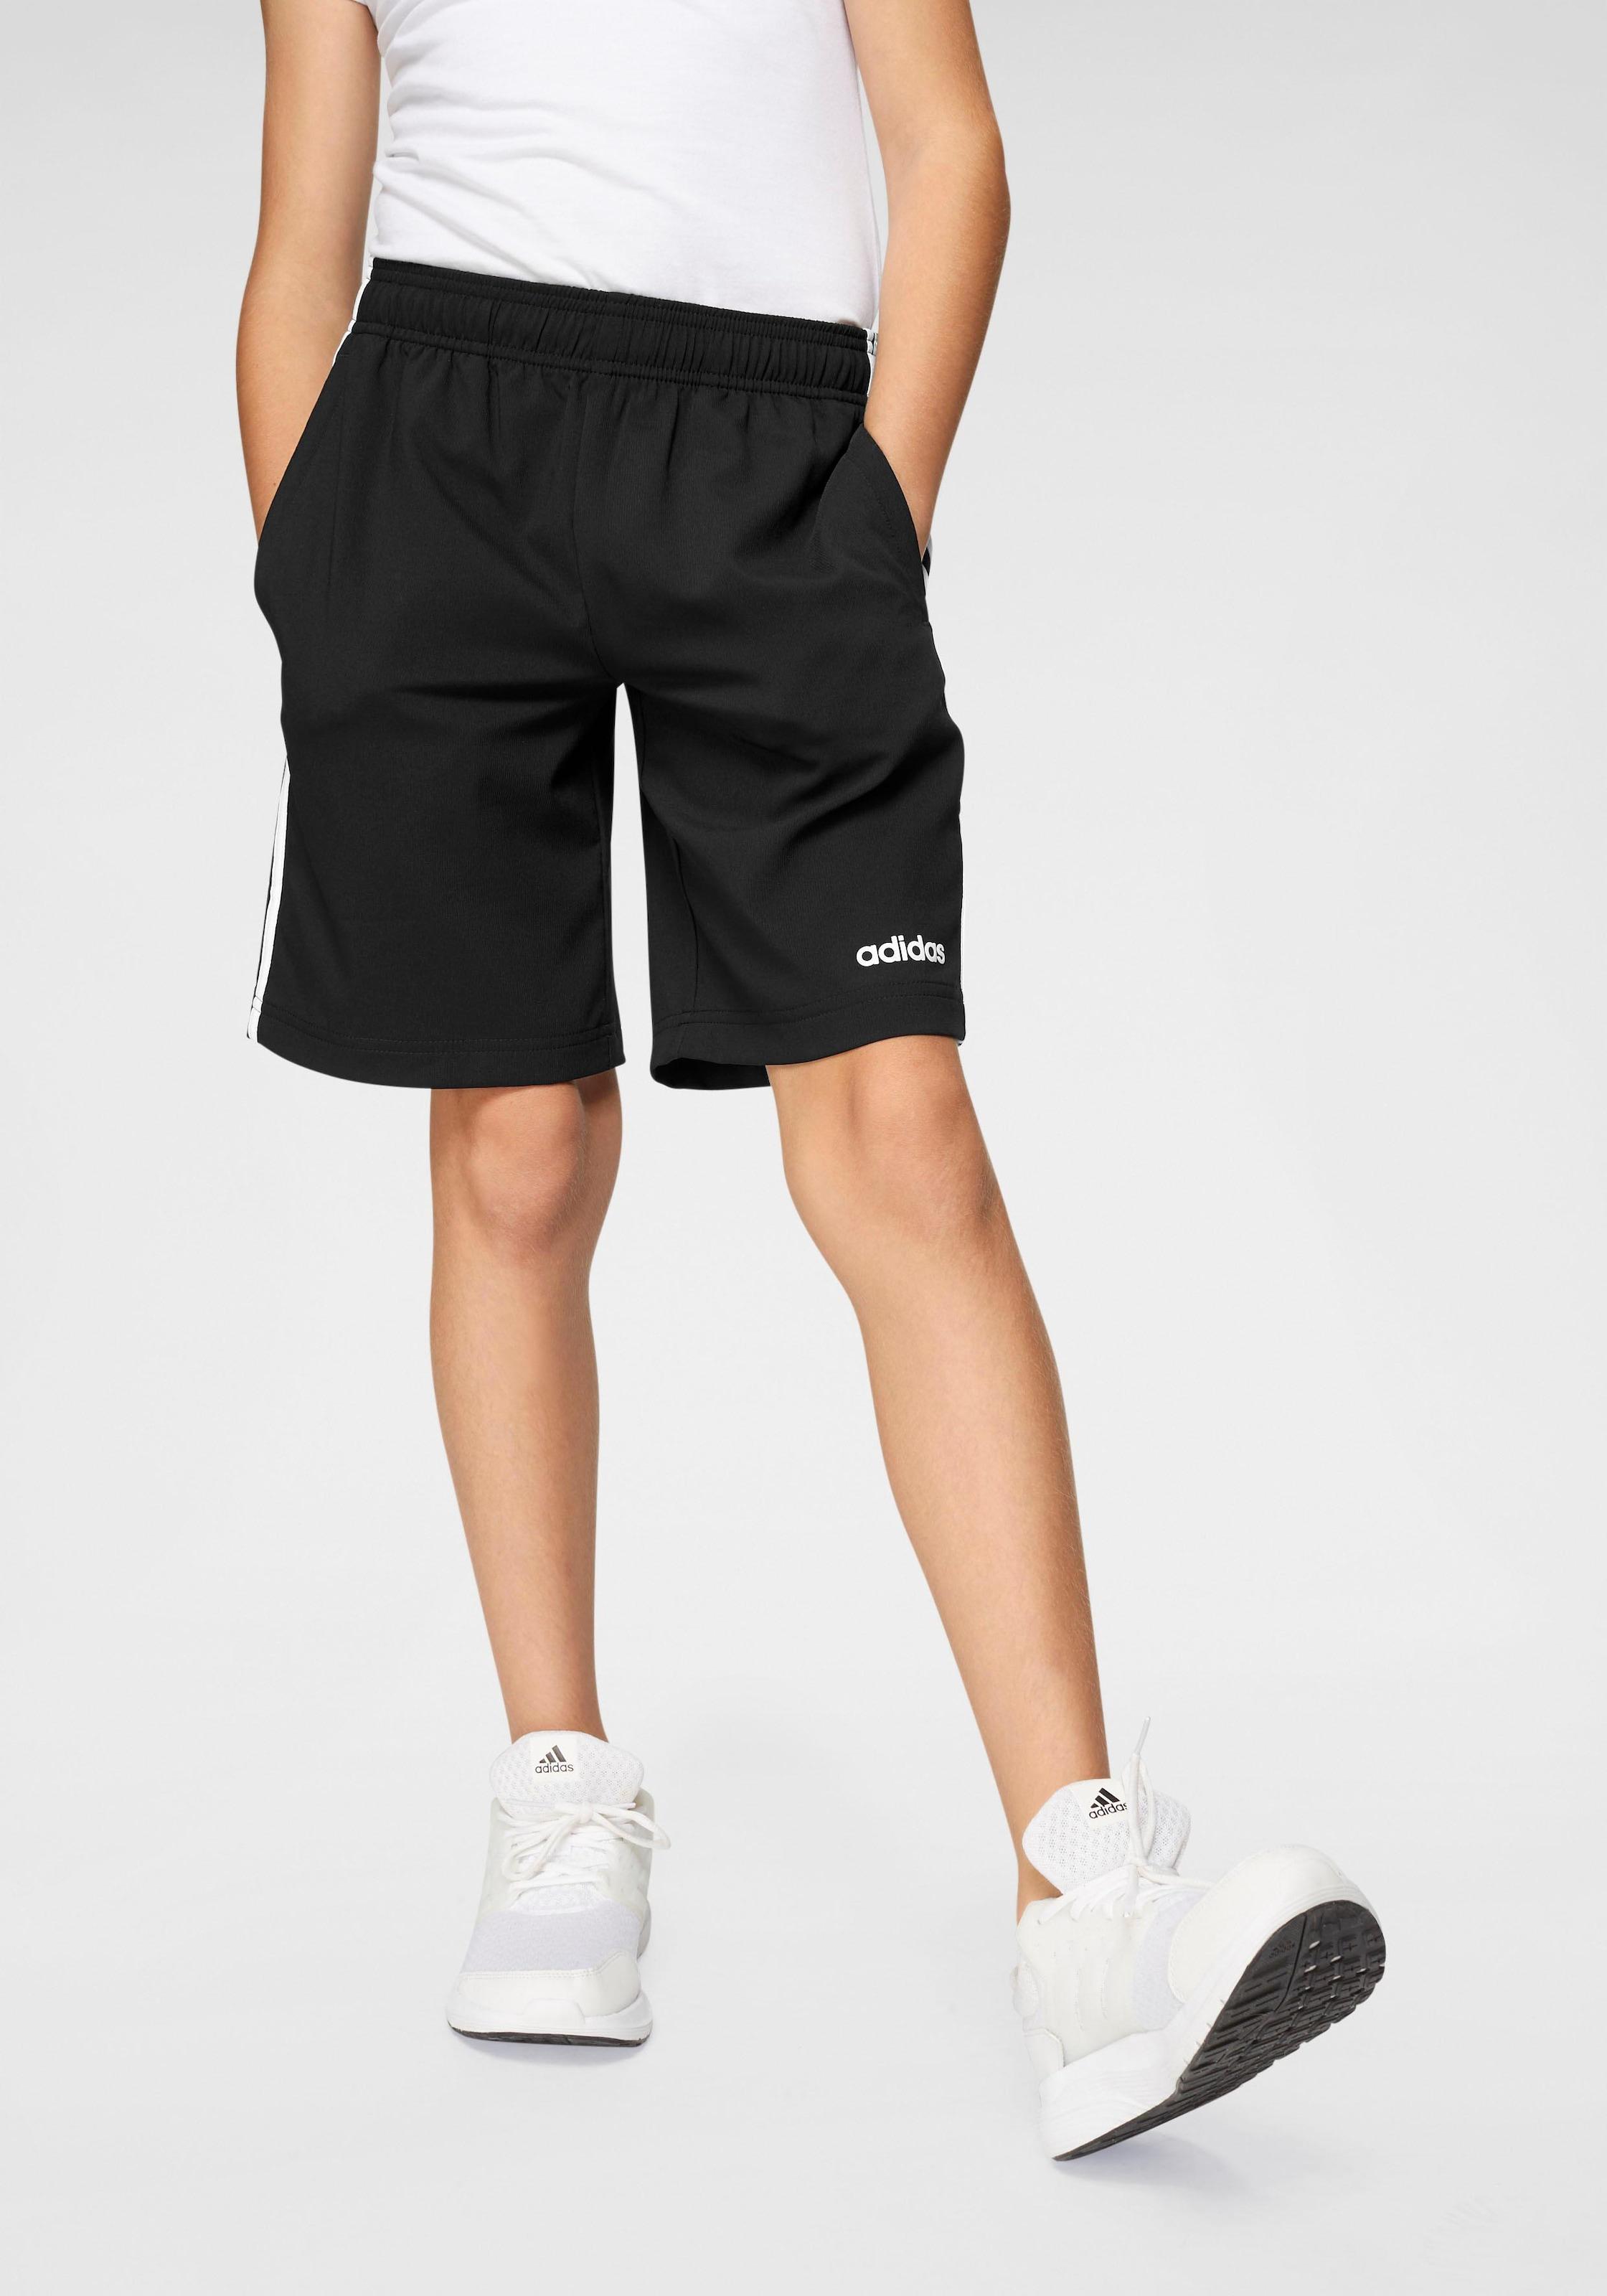 adidas Boys YB TS WOVEN Gym Suit